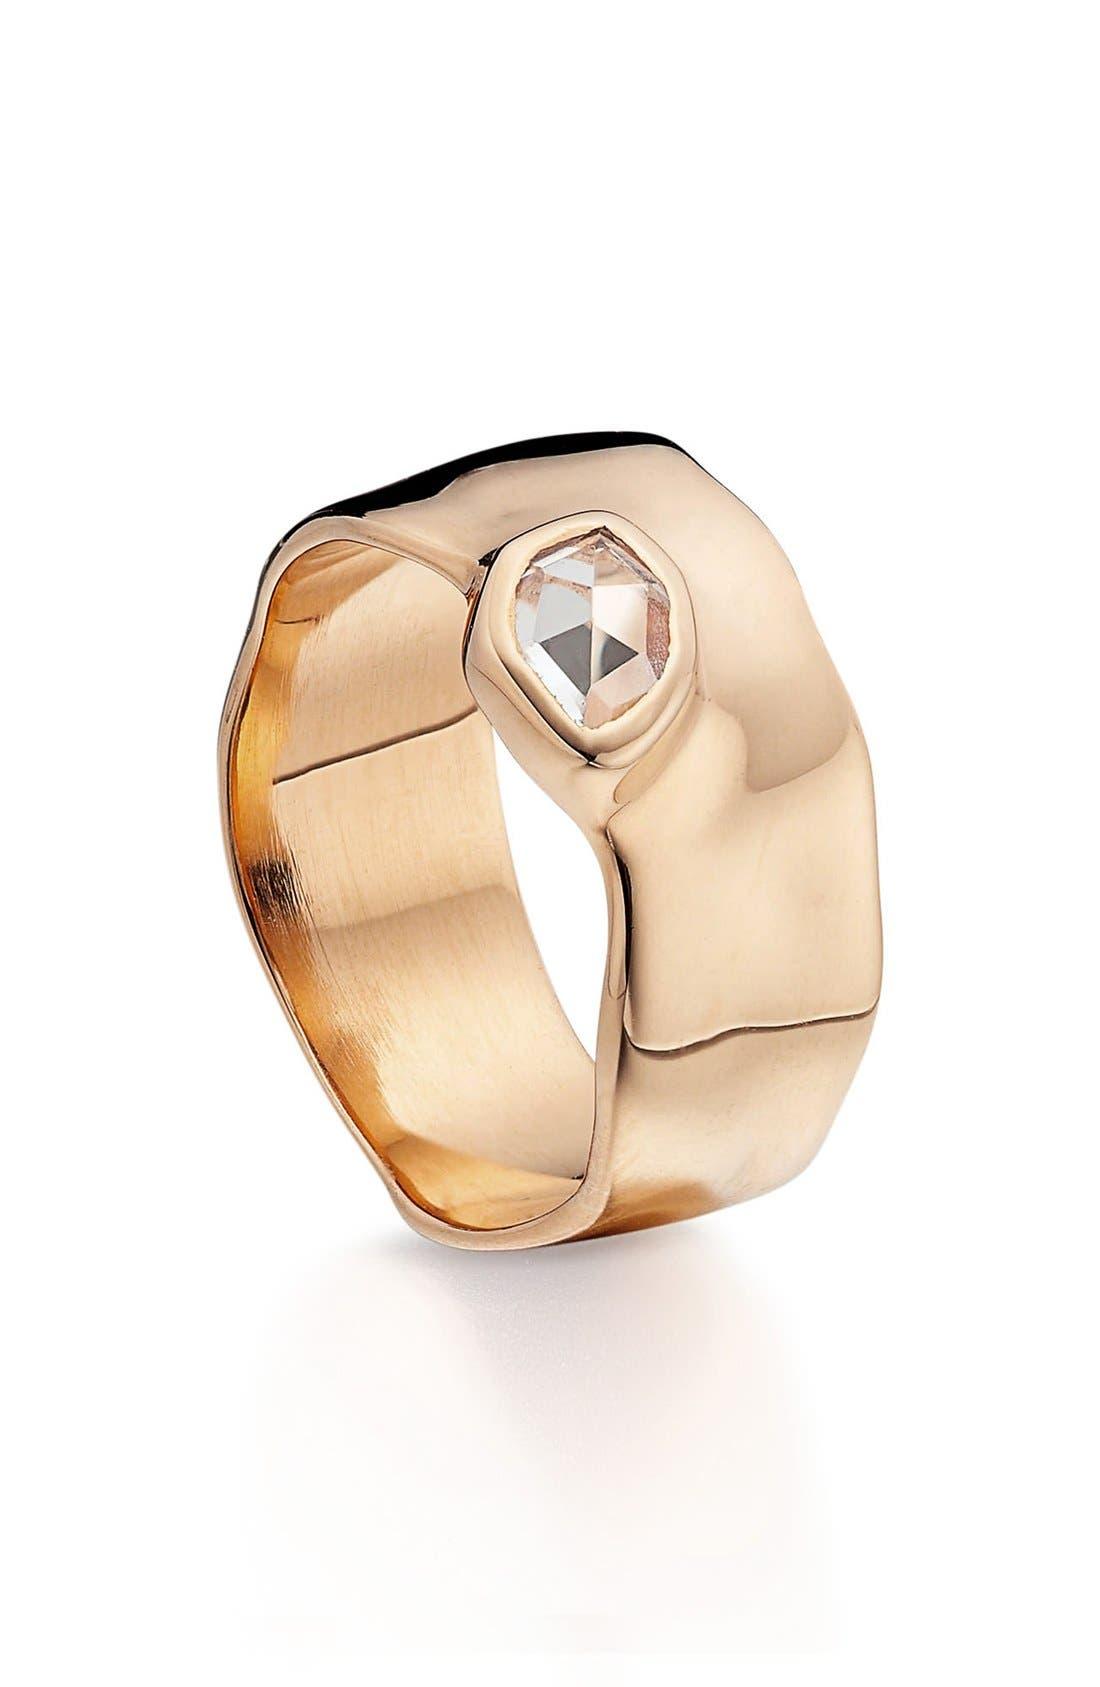 Monica Vinader 'Siren' Wide Band Ring